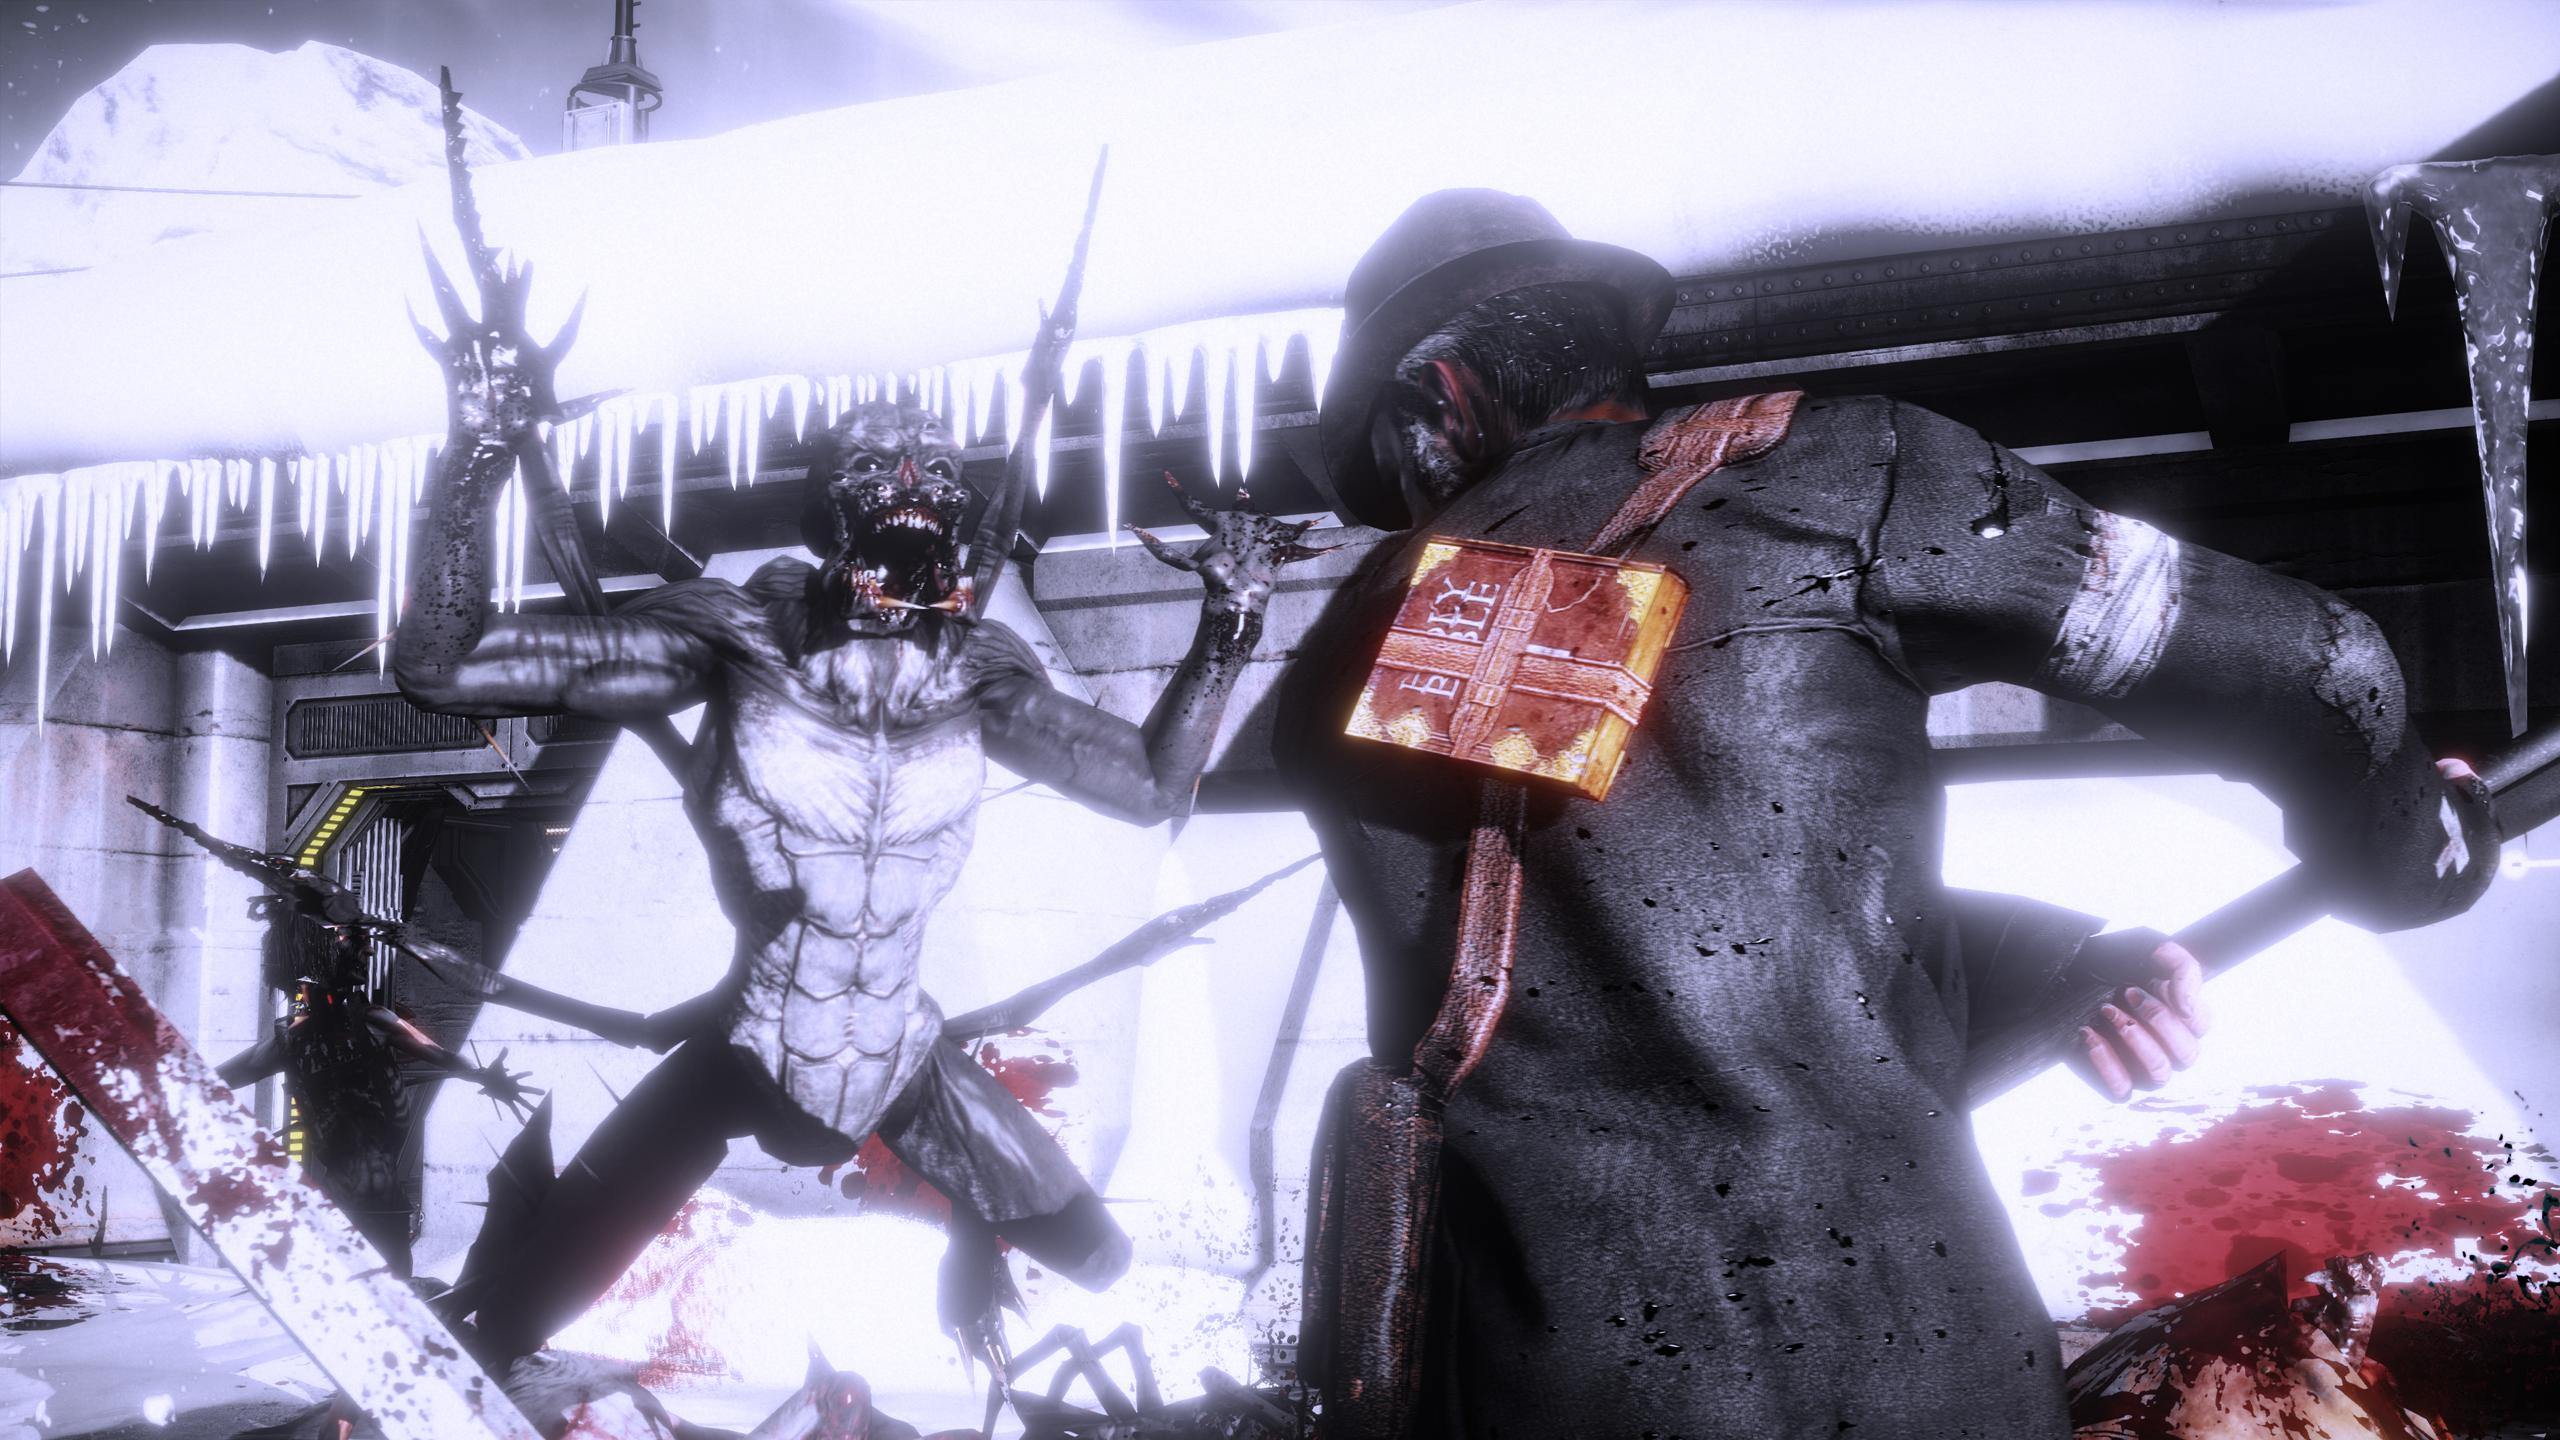 Čerstvá várka krvavých screenshotů z Killing Floor 2 105153